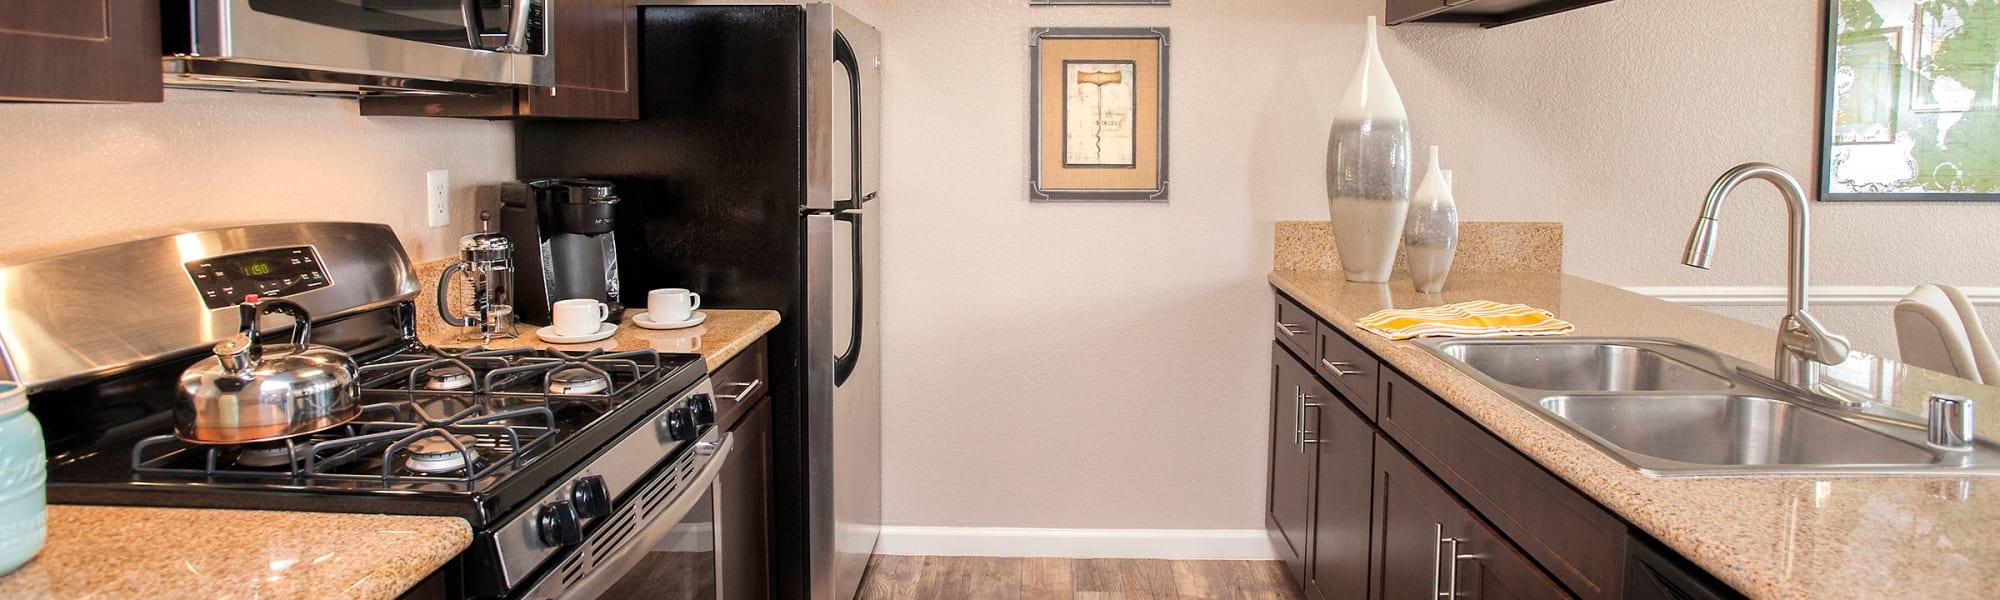 Floor plans at Deer Valley Apartment Homes in Roseville, California